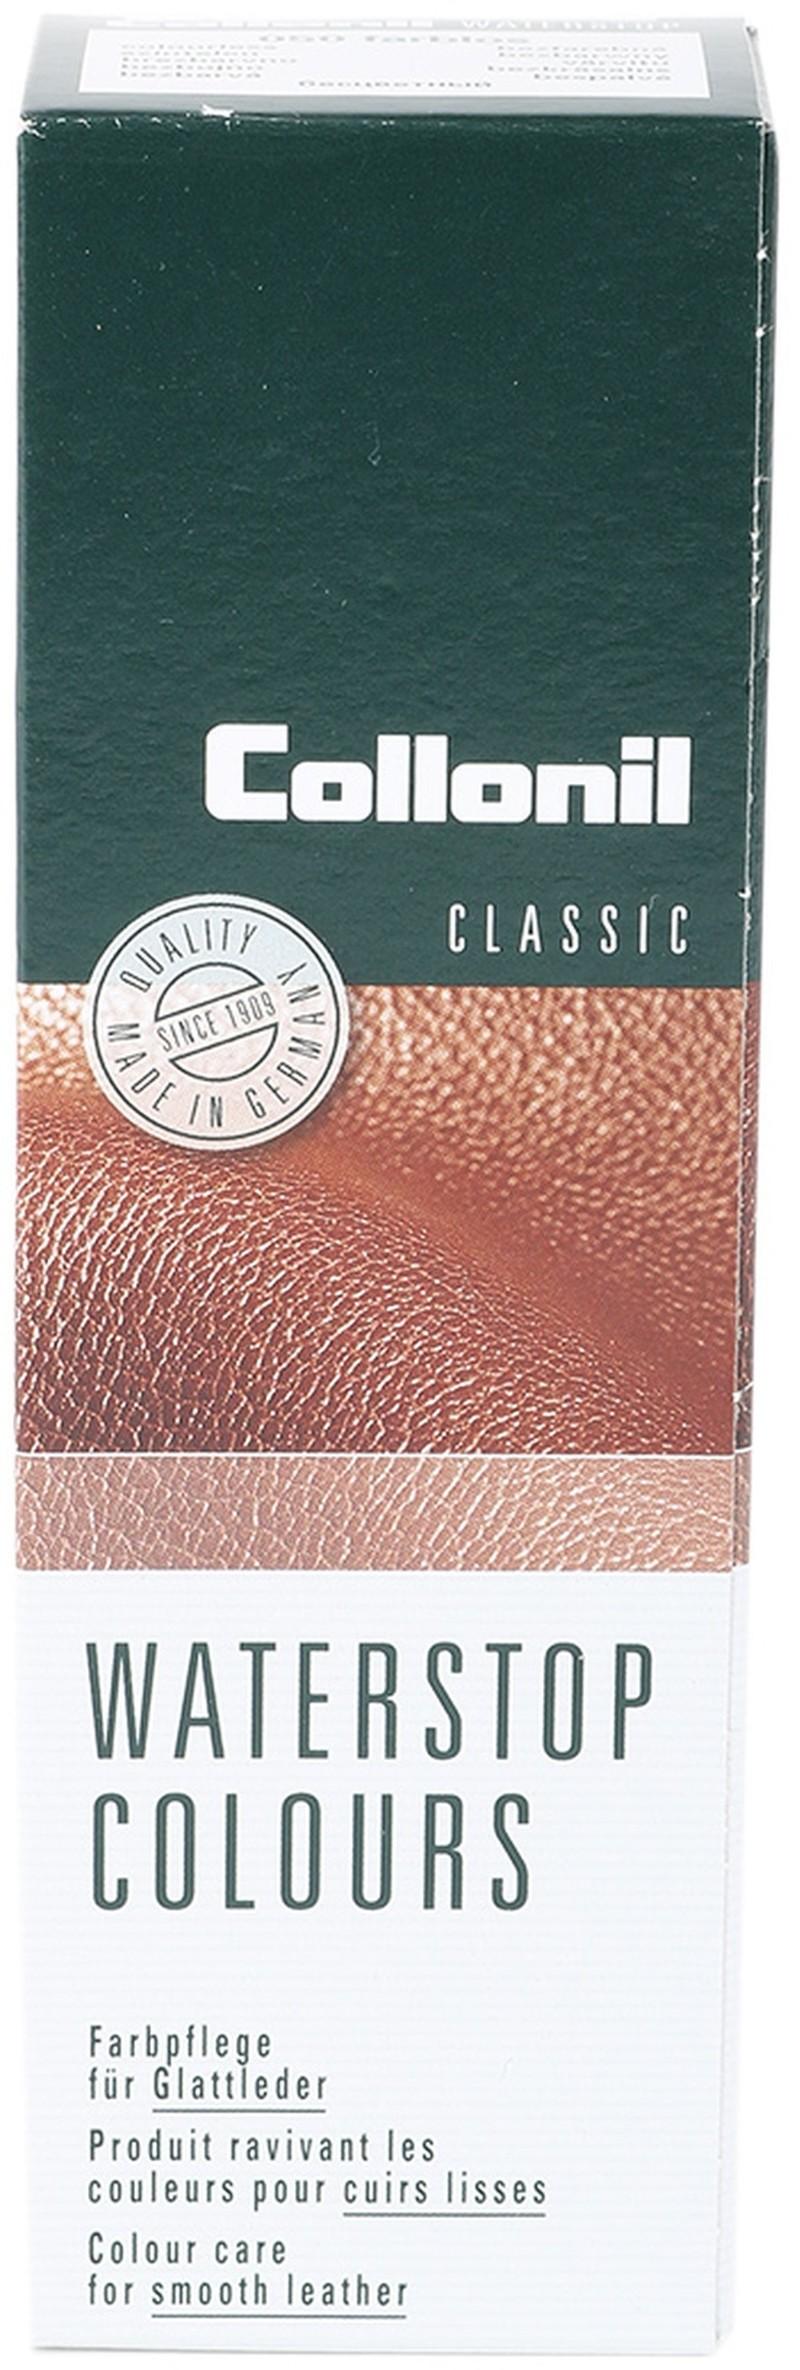 Collonil Waterstop Leather Cream Black photo 0